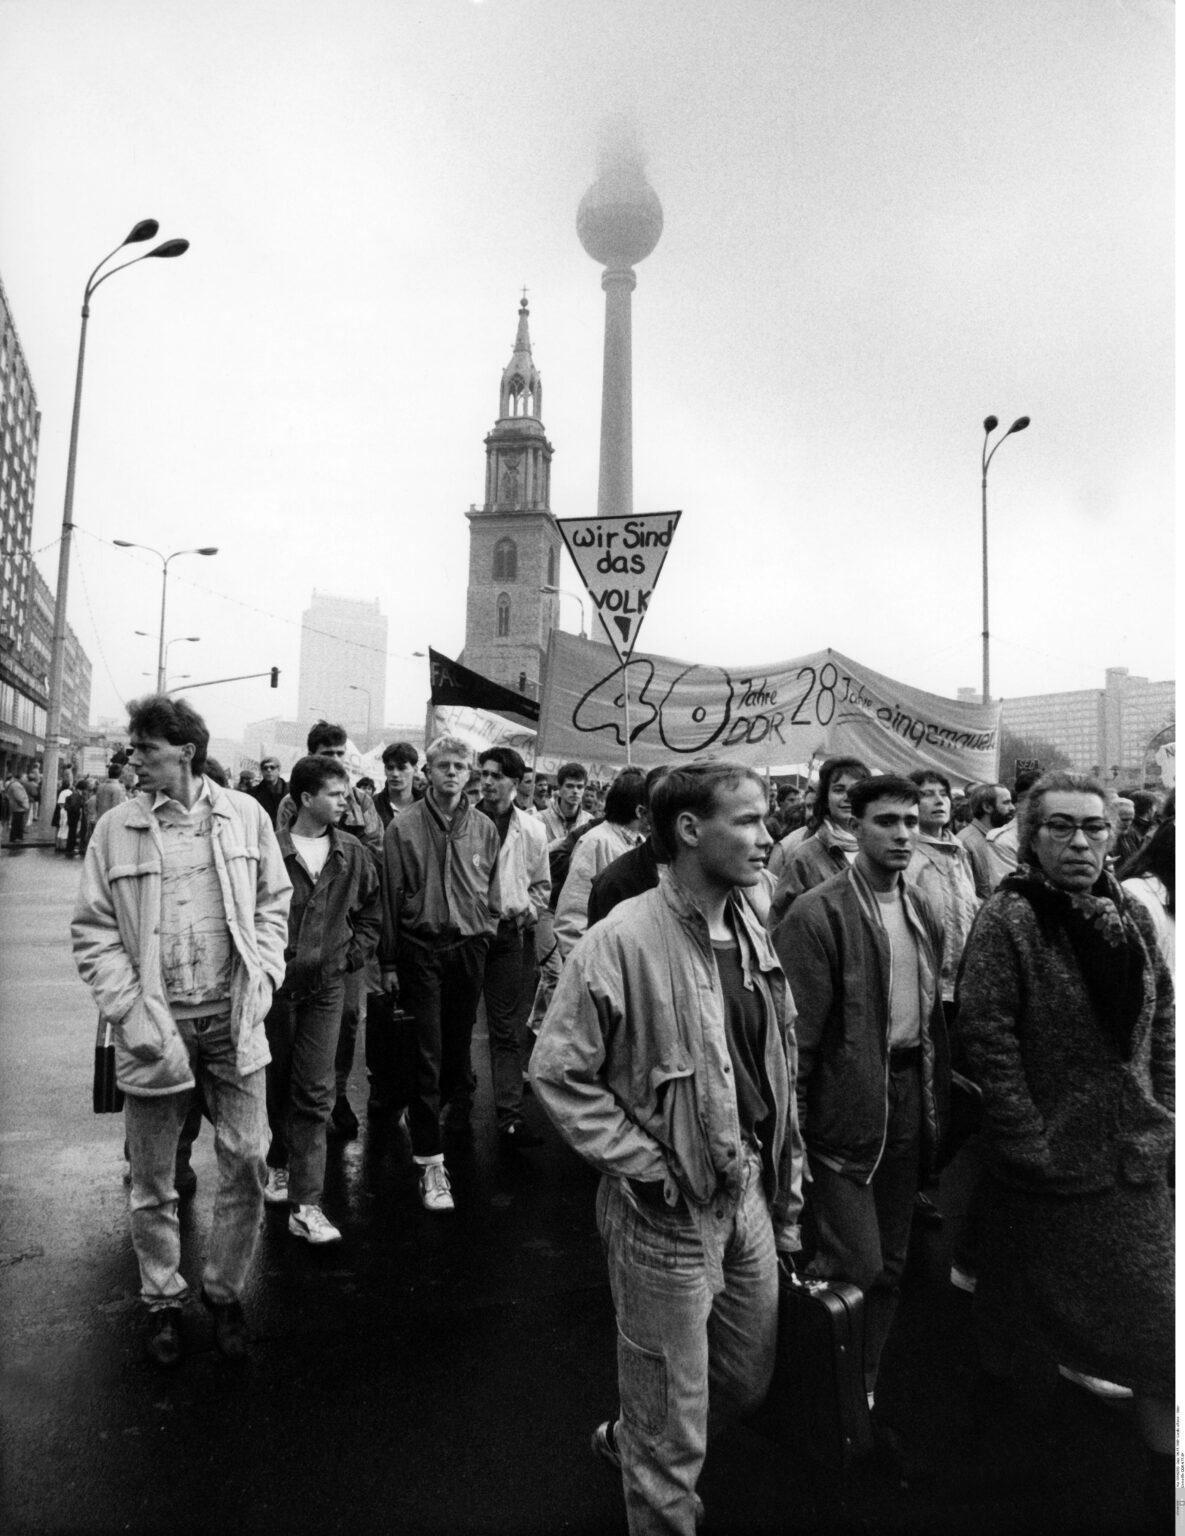 IMAGO / Jürgen Ritter